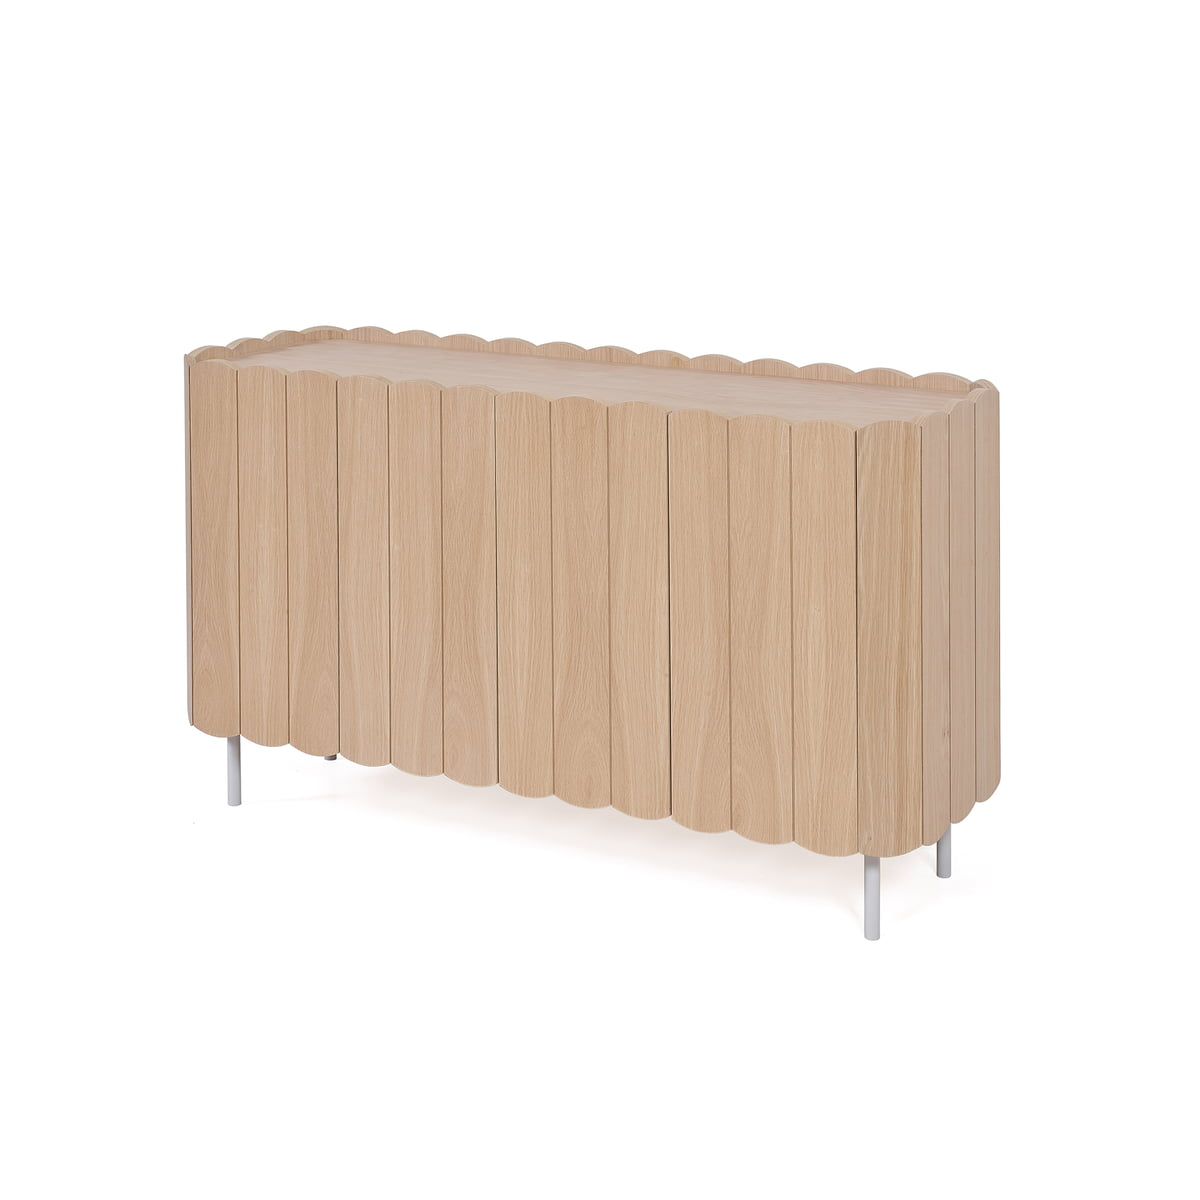 Harto cesar sideboard 124 cm eiche natur